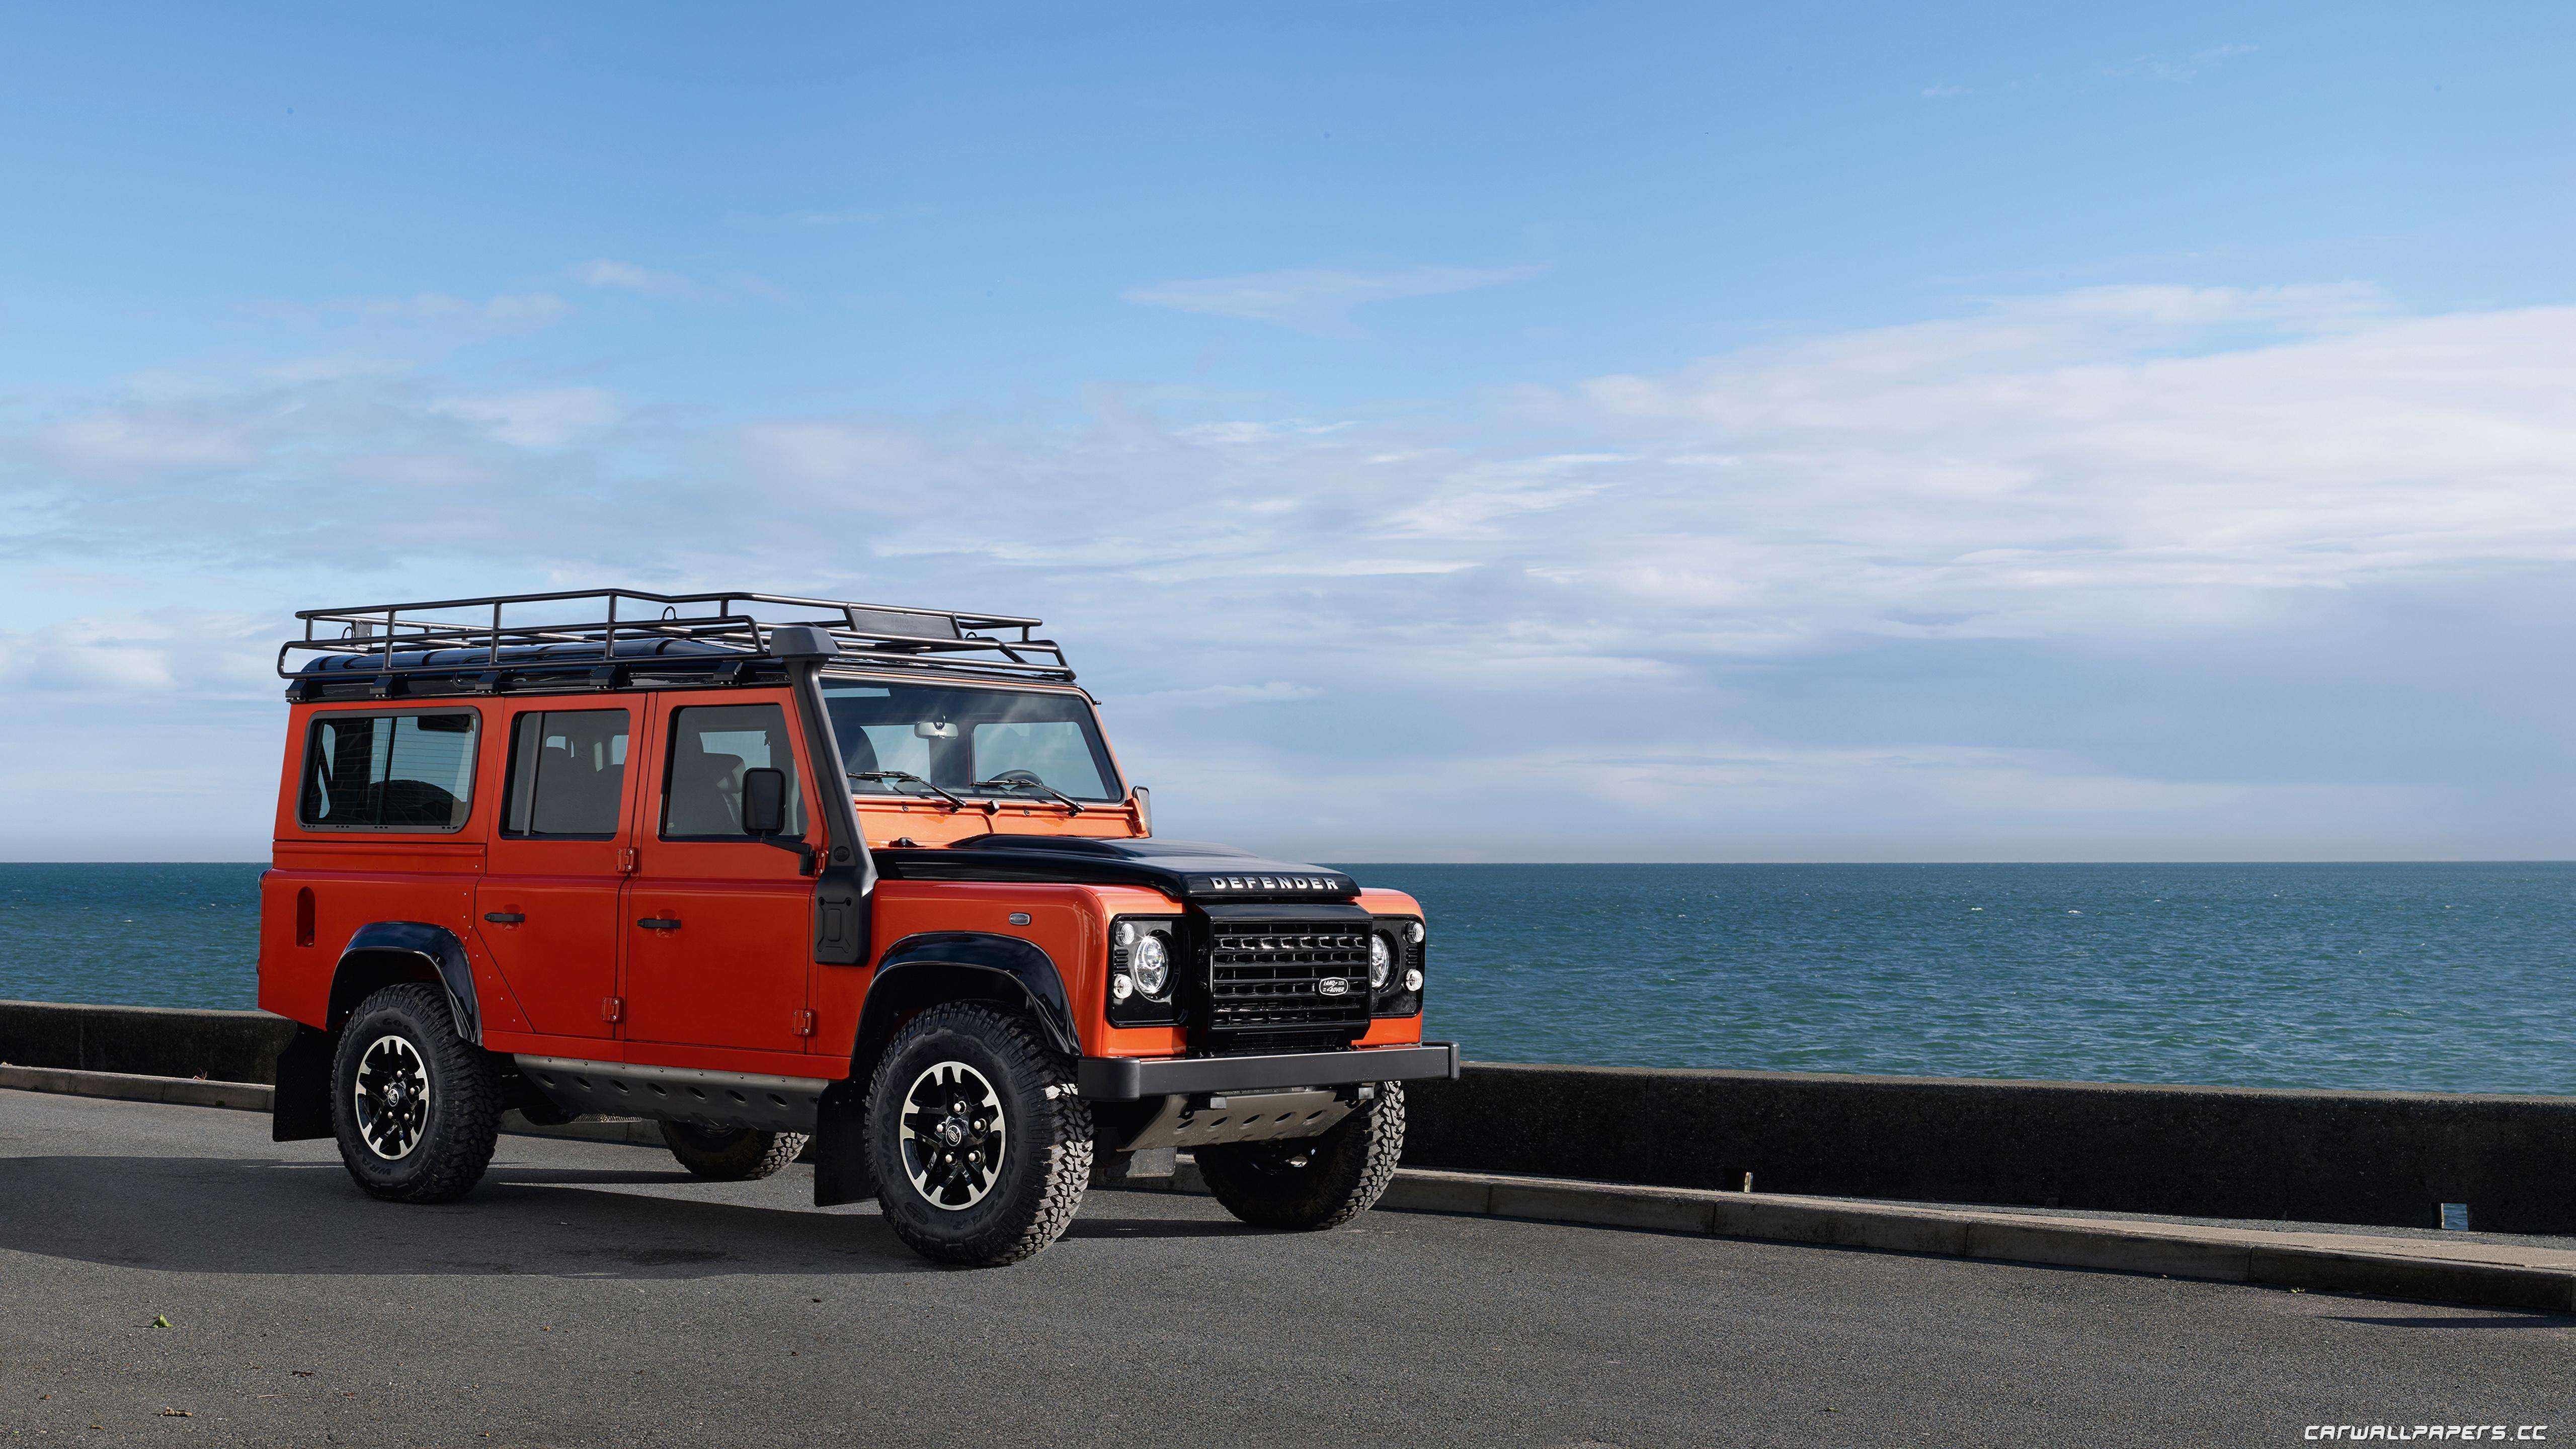 2011 land rover dc100 concept side 2 1280x960 wallpaper - Explore Land Rover Defender 110 Hd Wallpaper And More